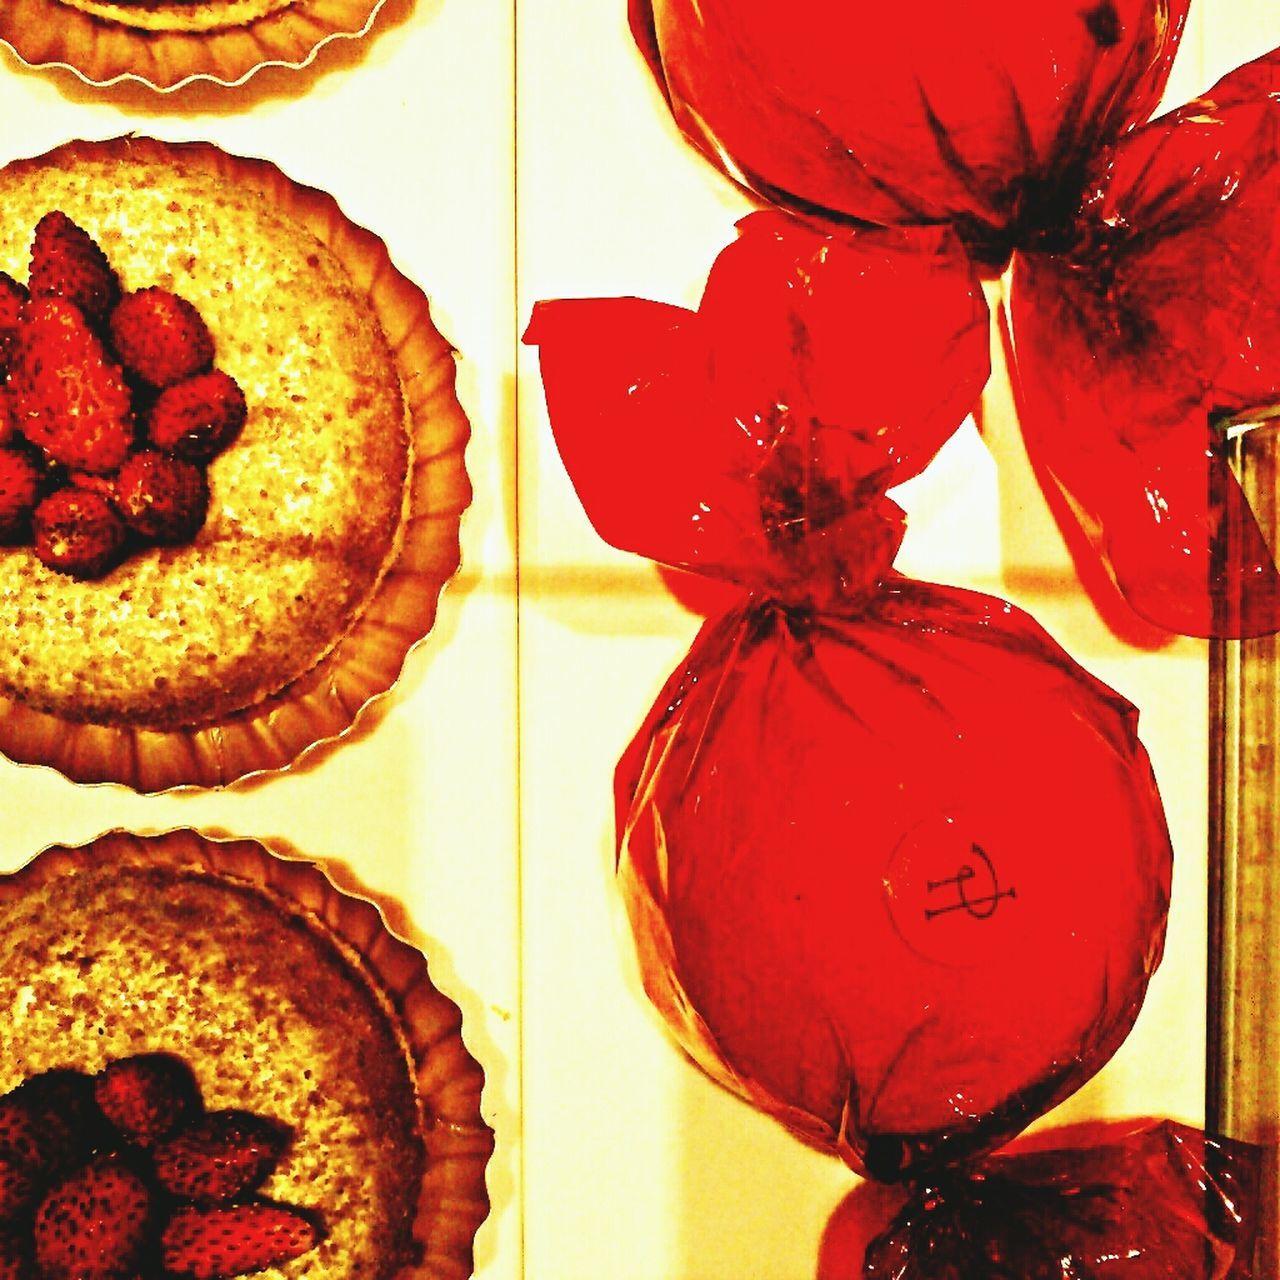 Things Organized Neatly Parisian Bakery Yummy Miam Show Us Your Takeaway! Parid Visual Feast